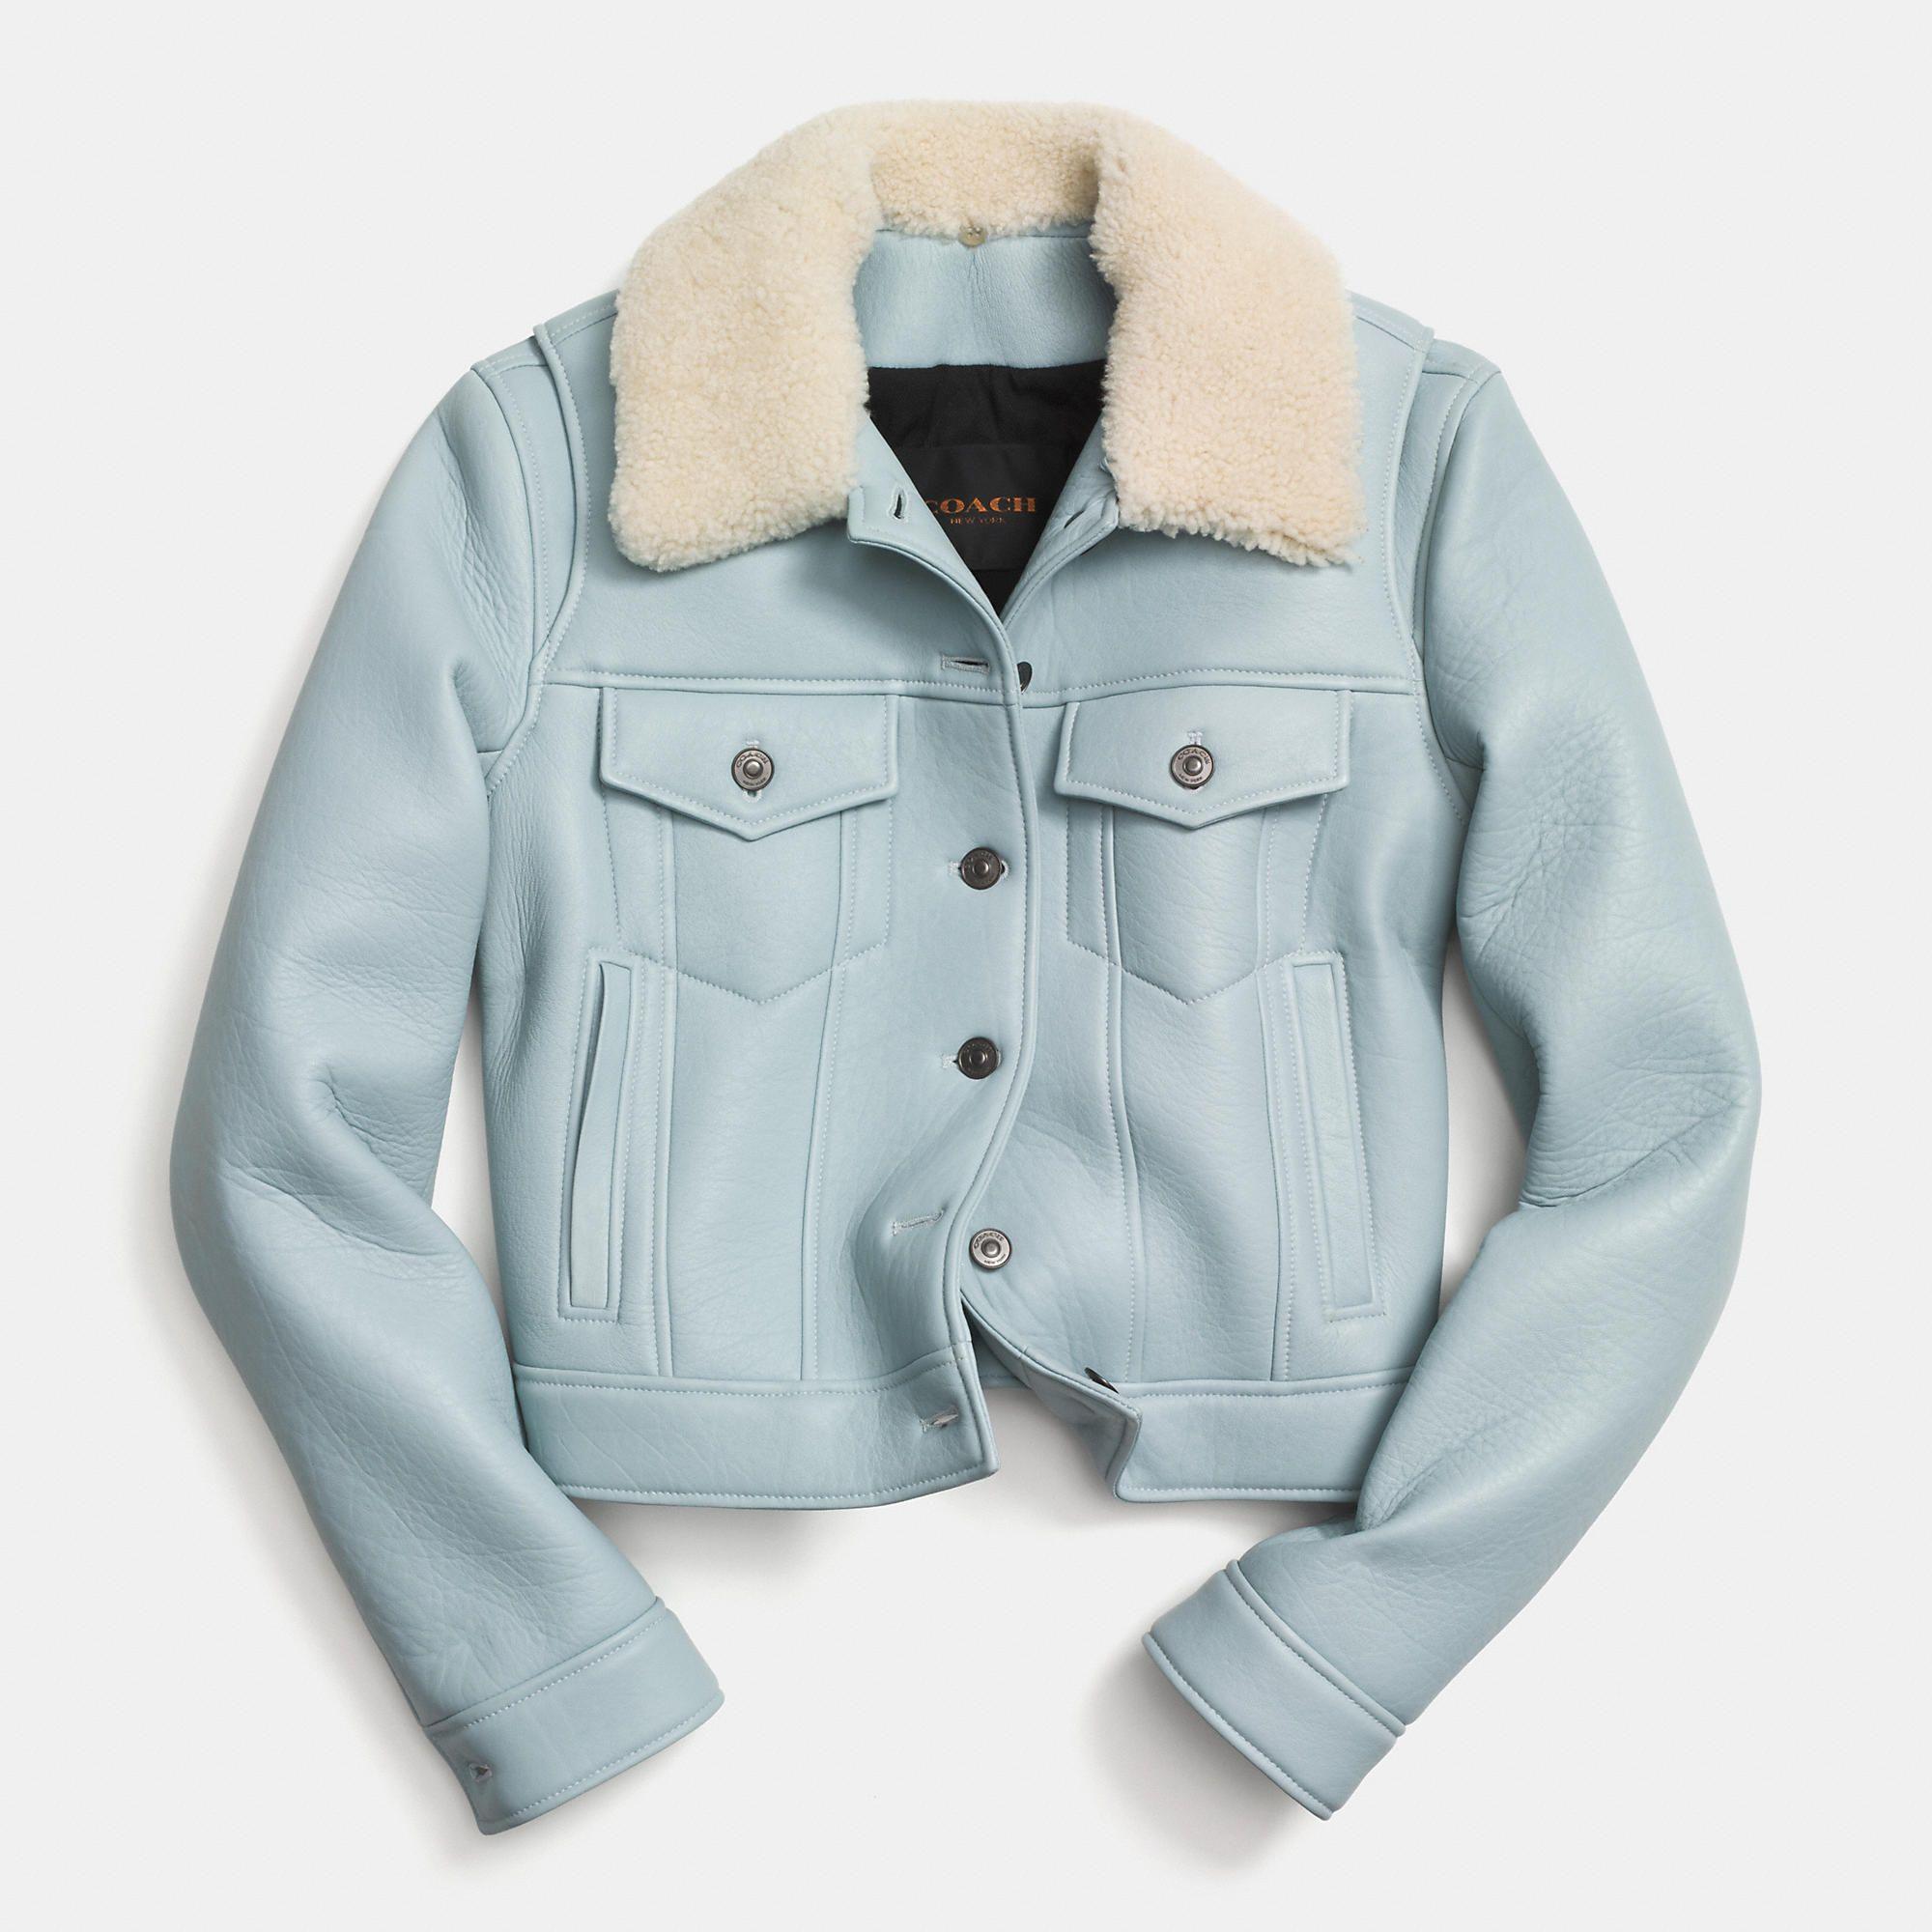 Coach LEATHER JEAN JACKET Blue leather jacket